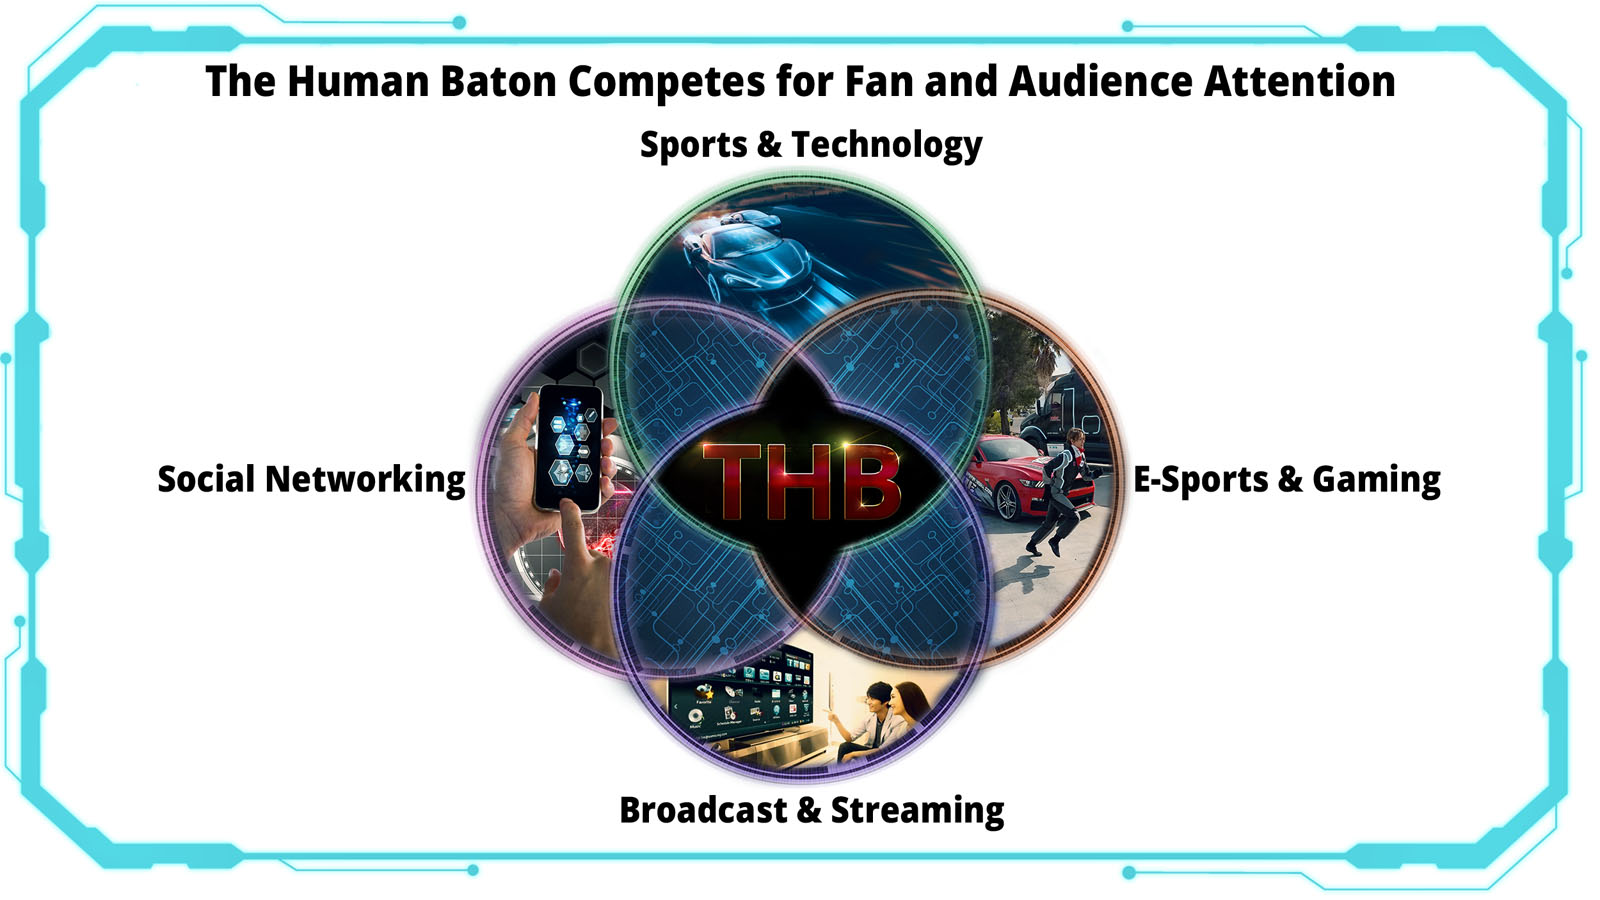 THB: The Human Baton ← Netcapital